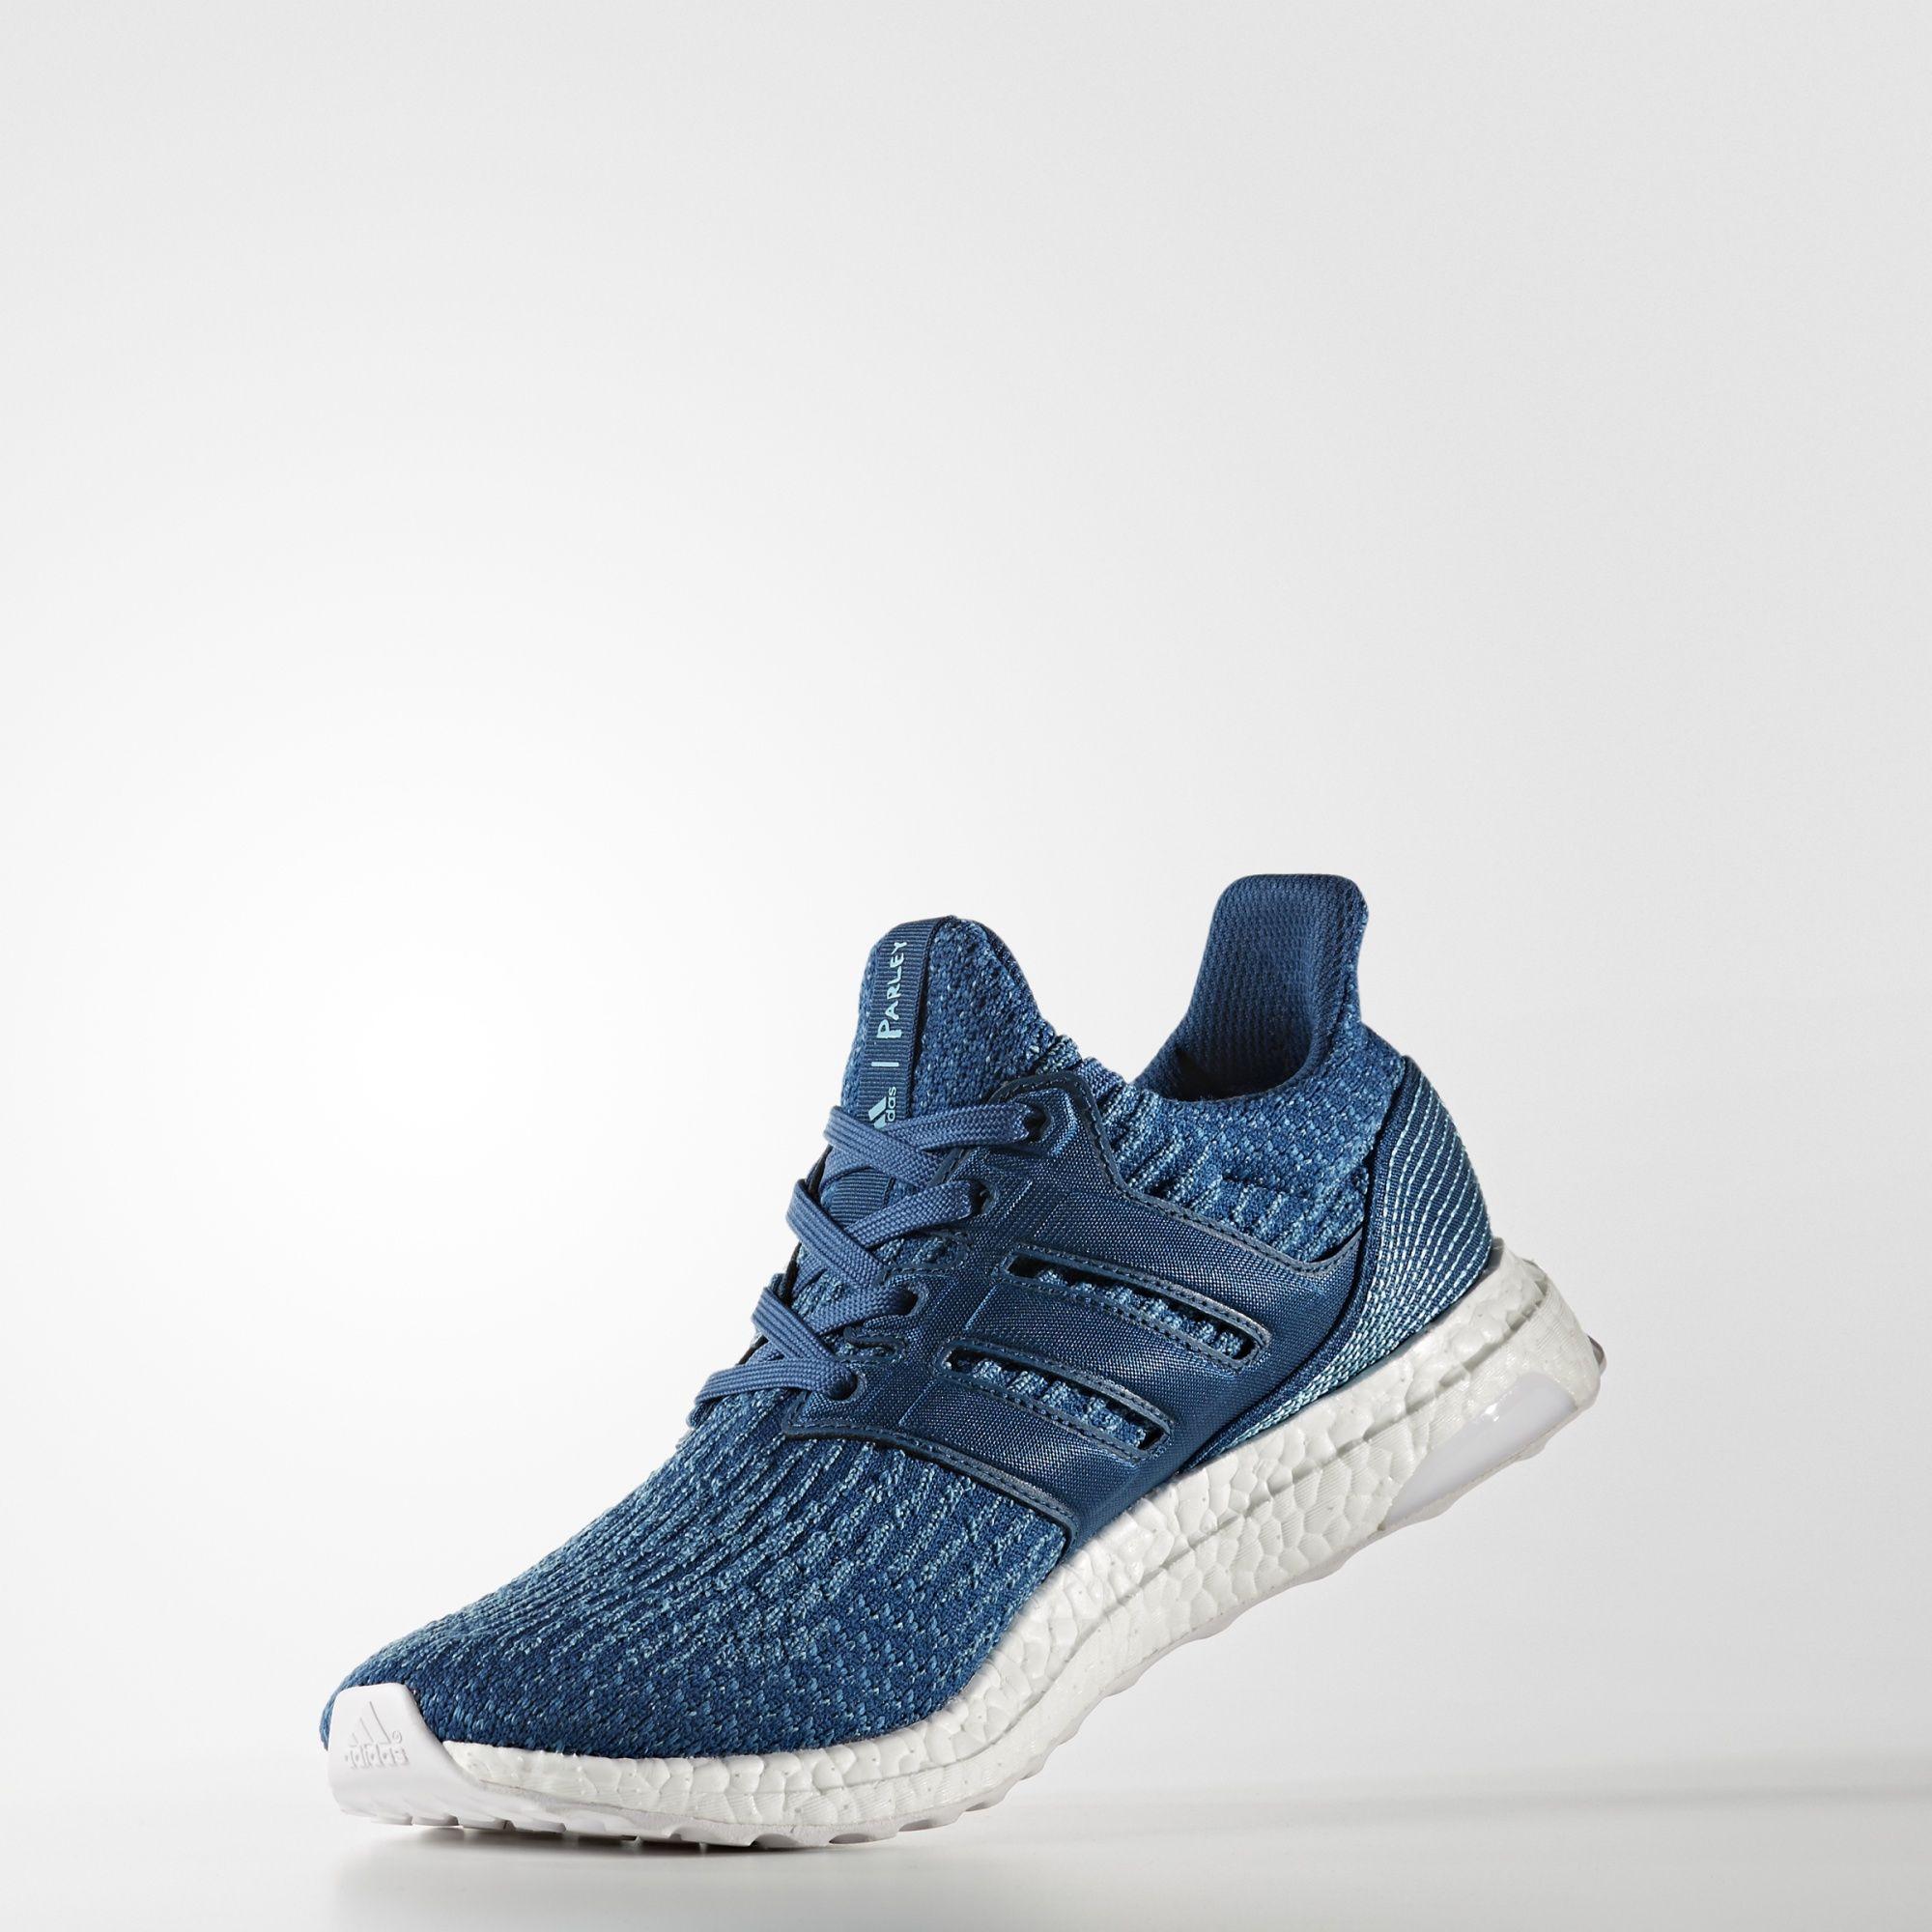 Parley x adidas Ultra Boost Blue Night BB4762 3